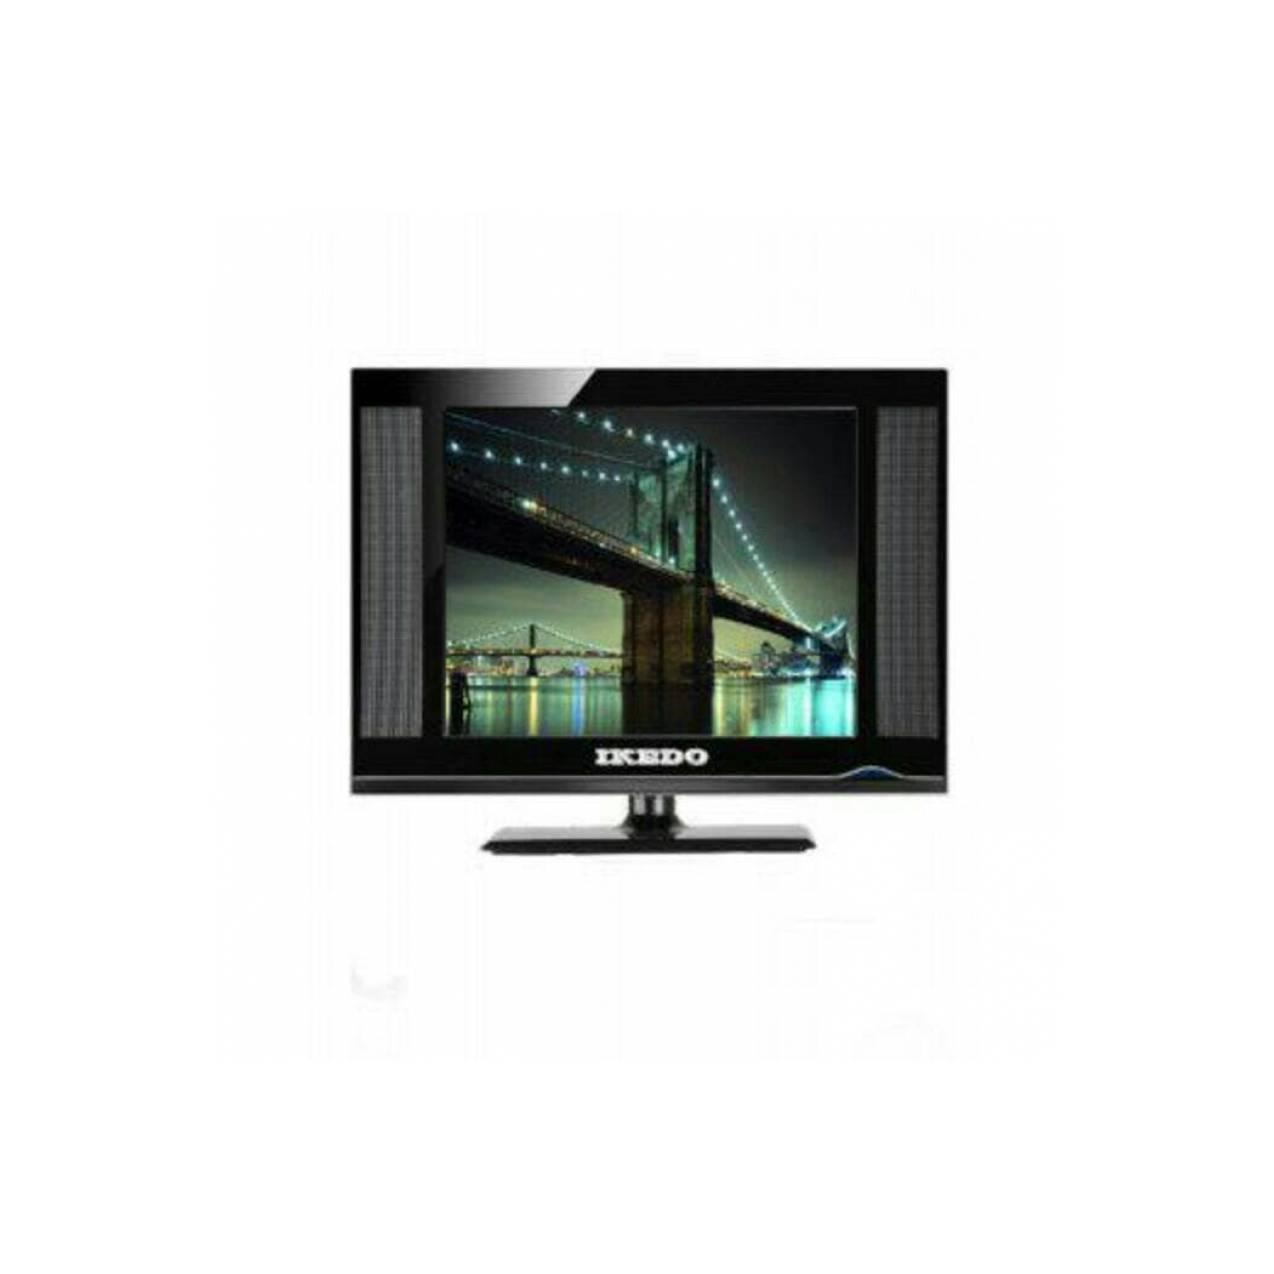 Ikedo Led Tv 17 Inch Hitam Cek Harga Terkini Dan Terlengkap Indonesia 32 M1a Dolby Surround Sytema Gratis Powerstrip Huntkey Sga301 Lt 17l2u